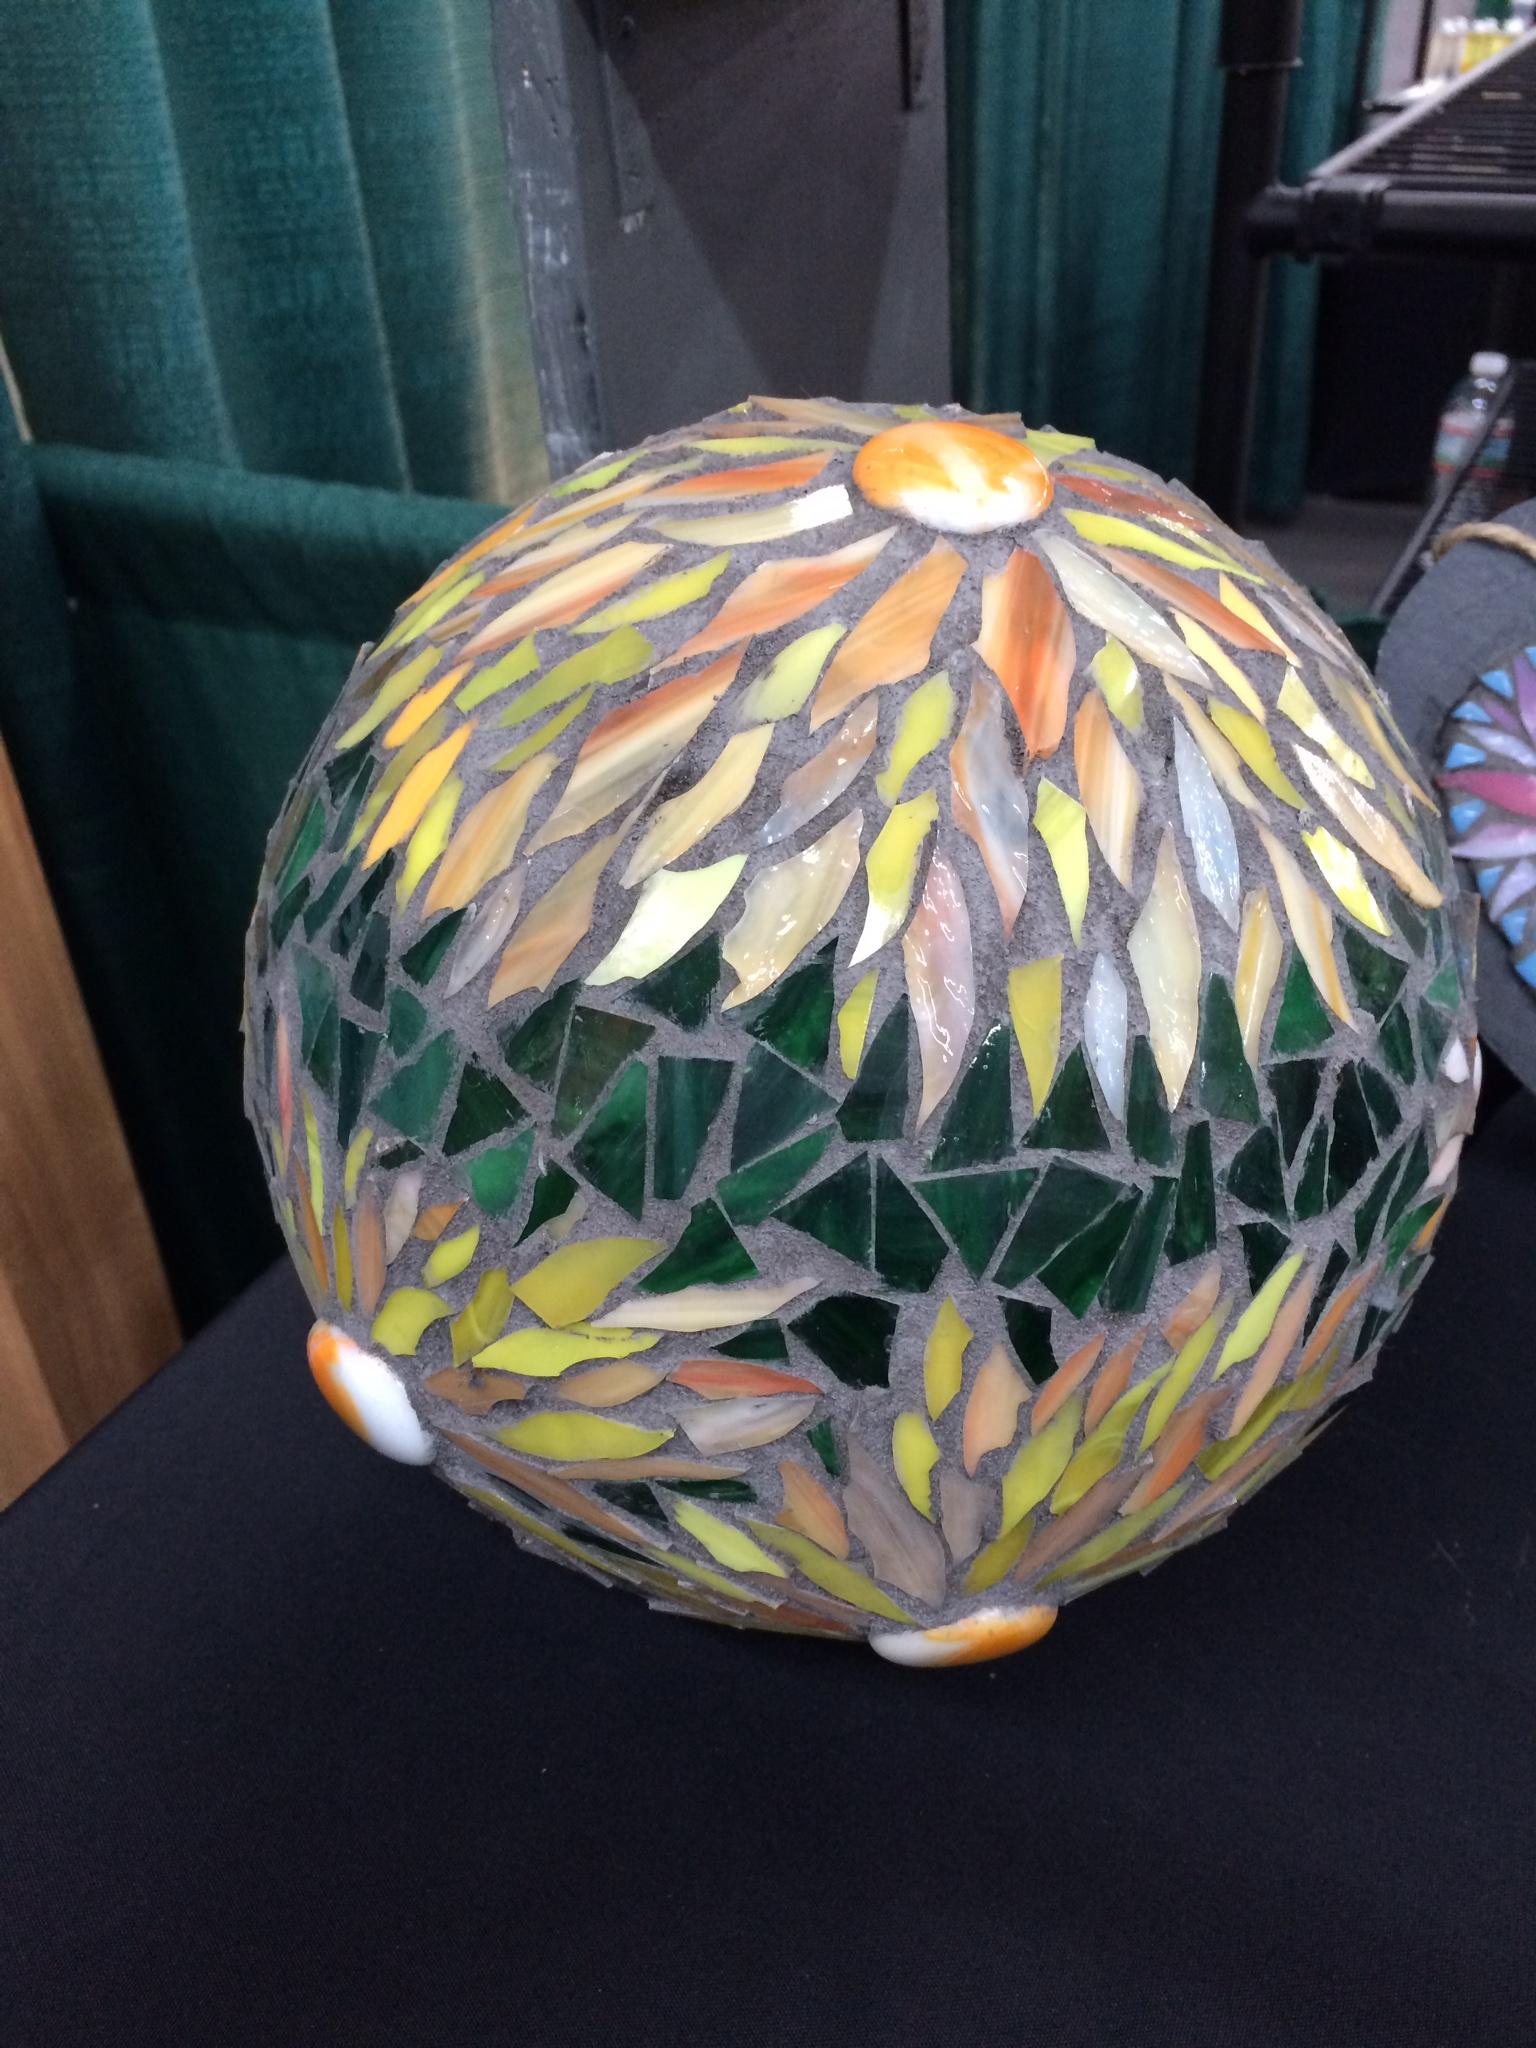 Stained glass mosaic gazing ball